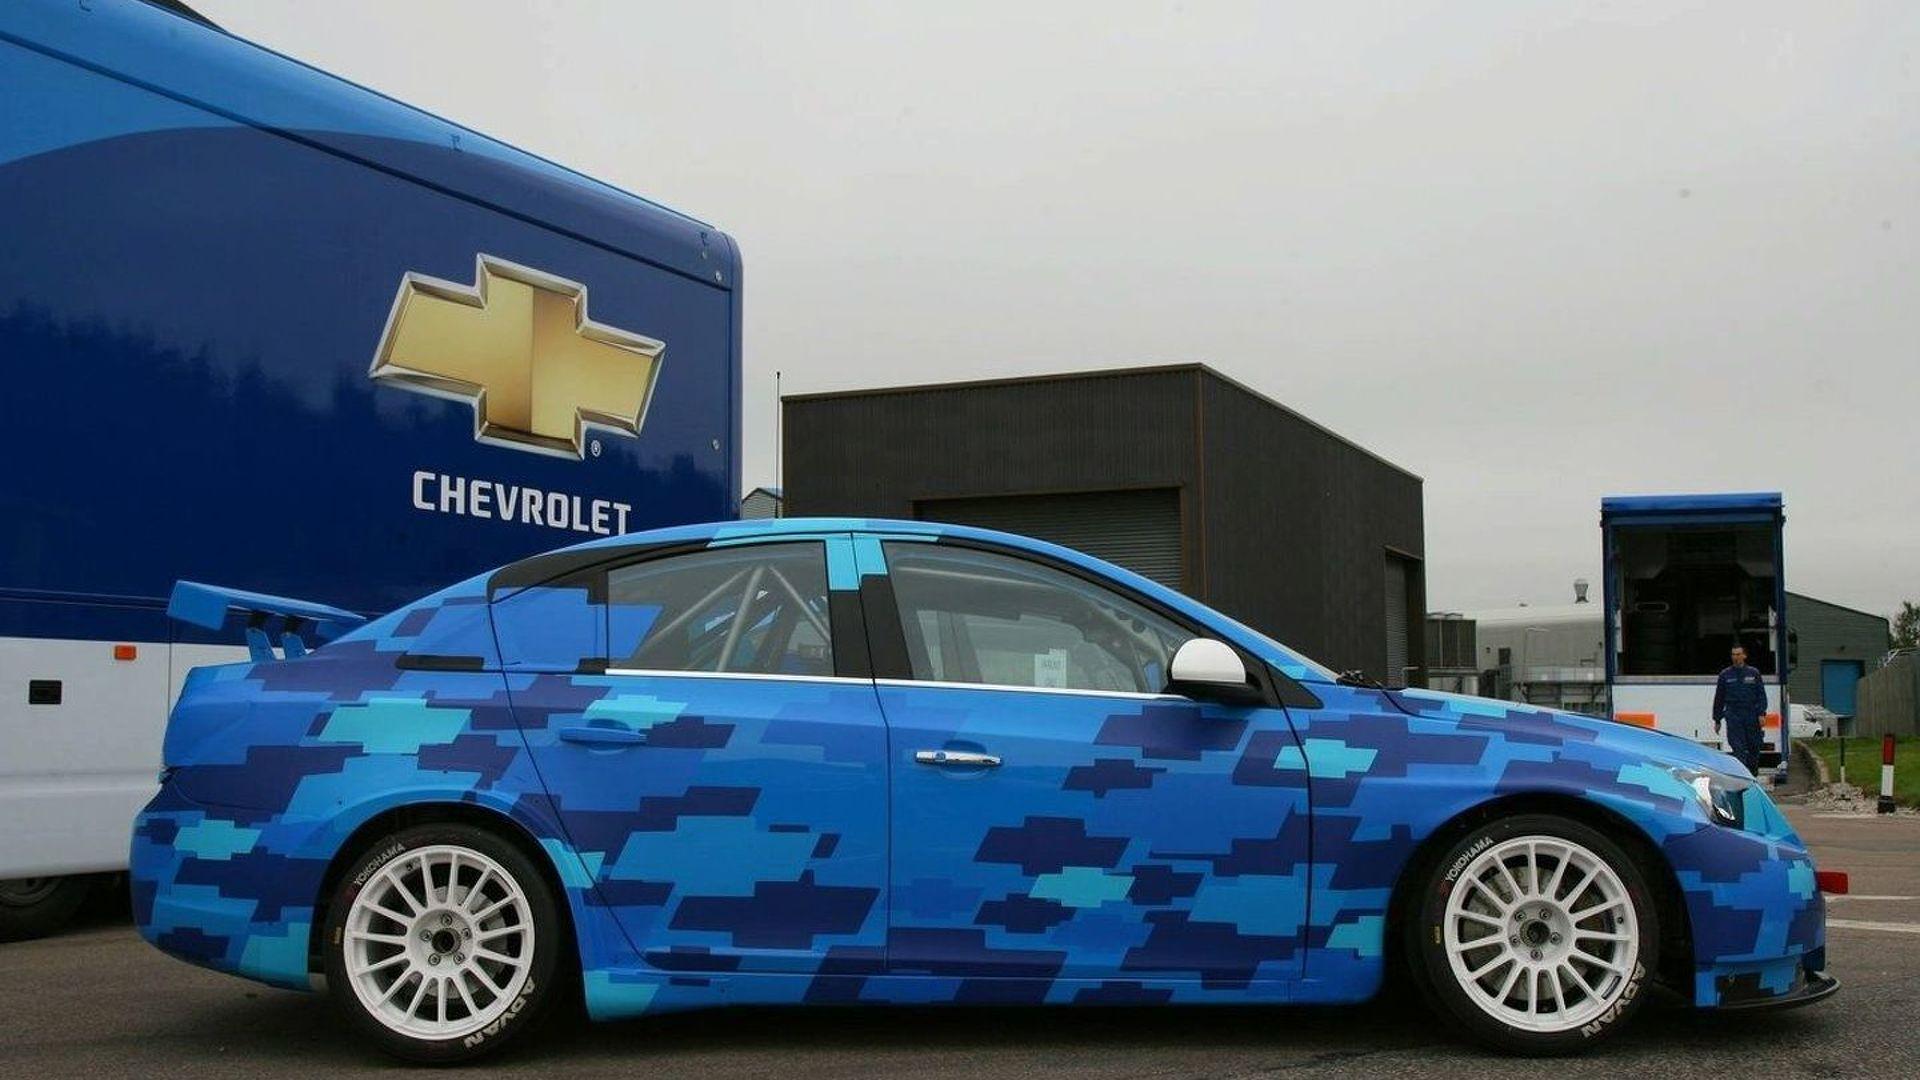 Chevrolet Presents the Cruze for 2009 WTCC